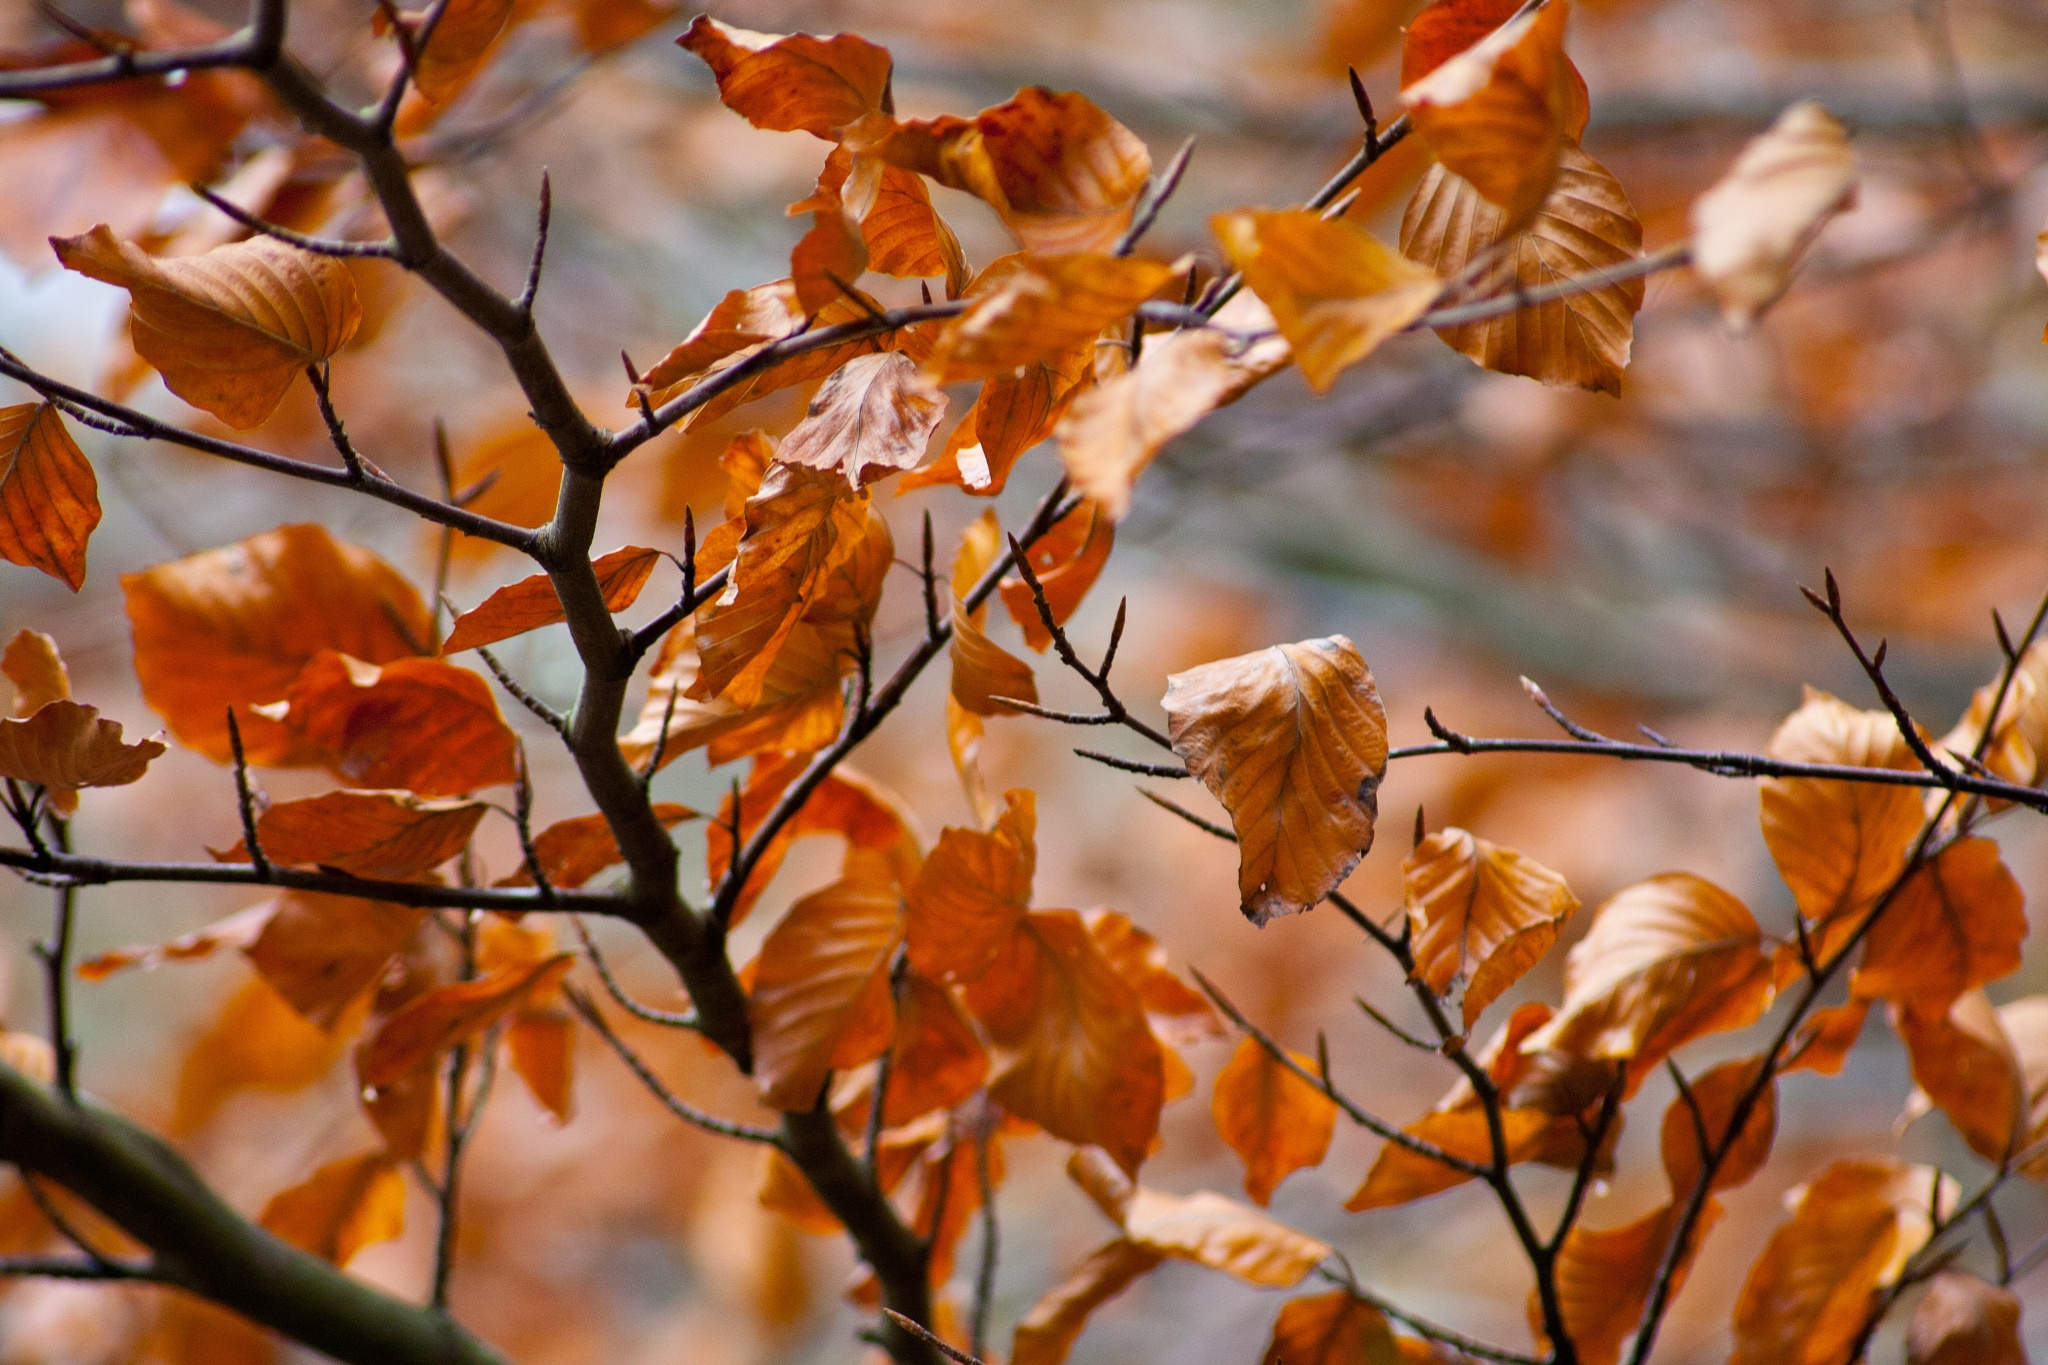 The Copper Tree by Steve Rowe